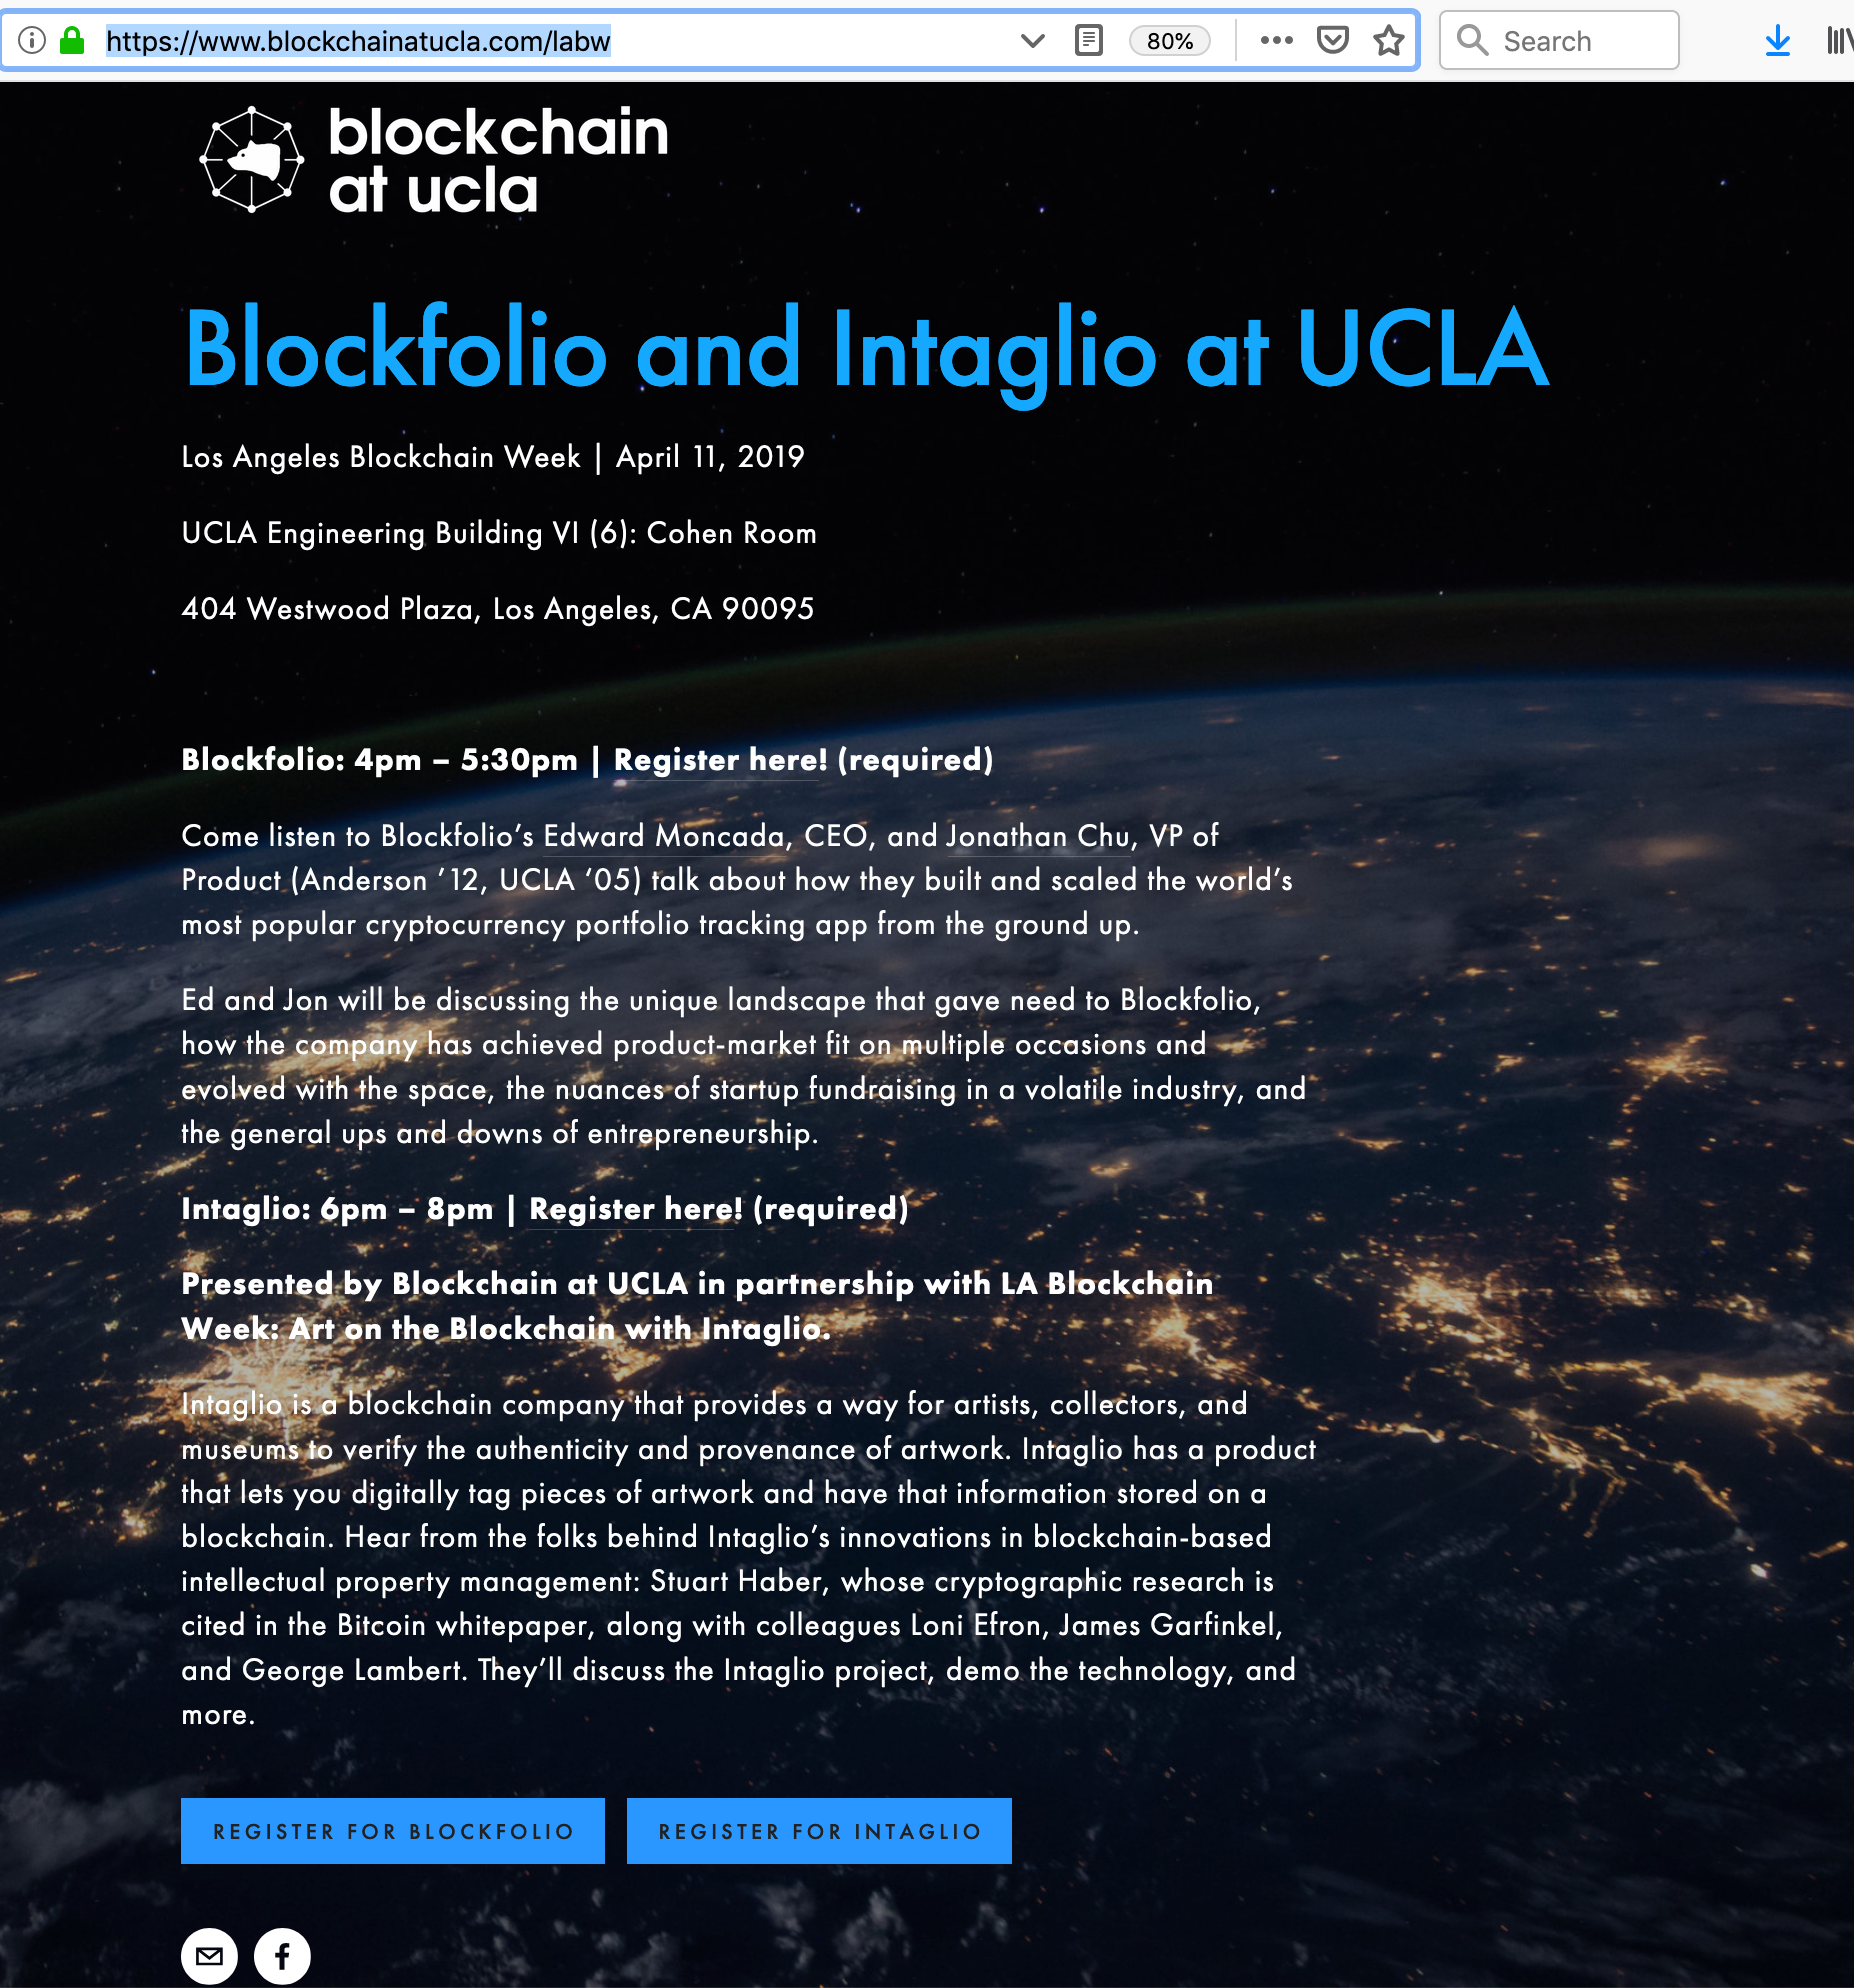 UCLA-Intaglio.png